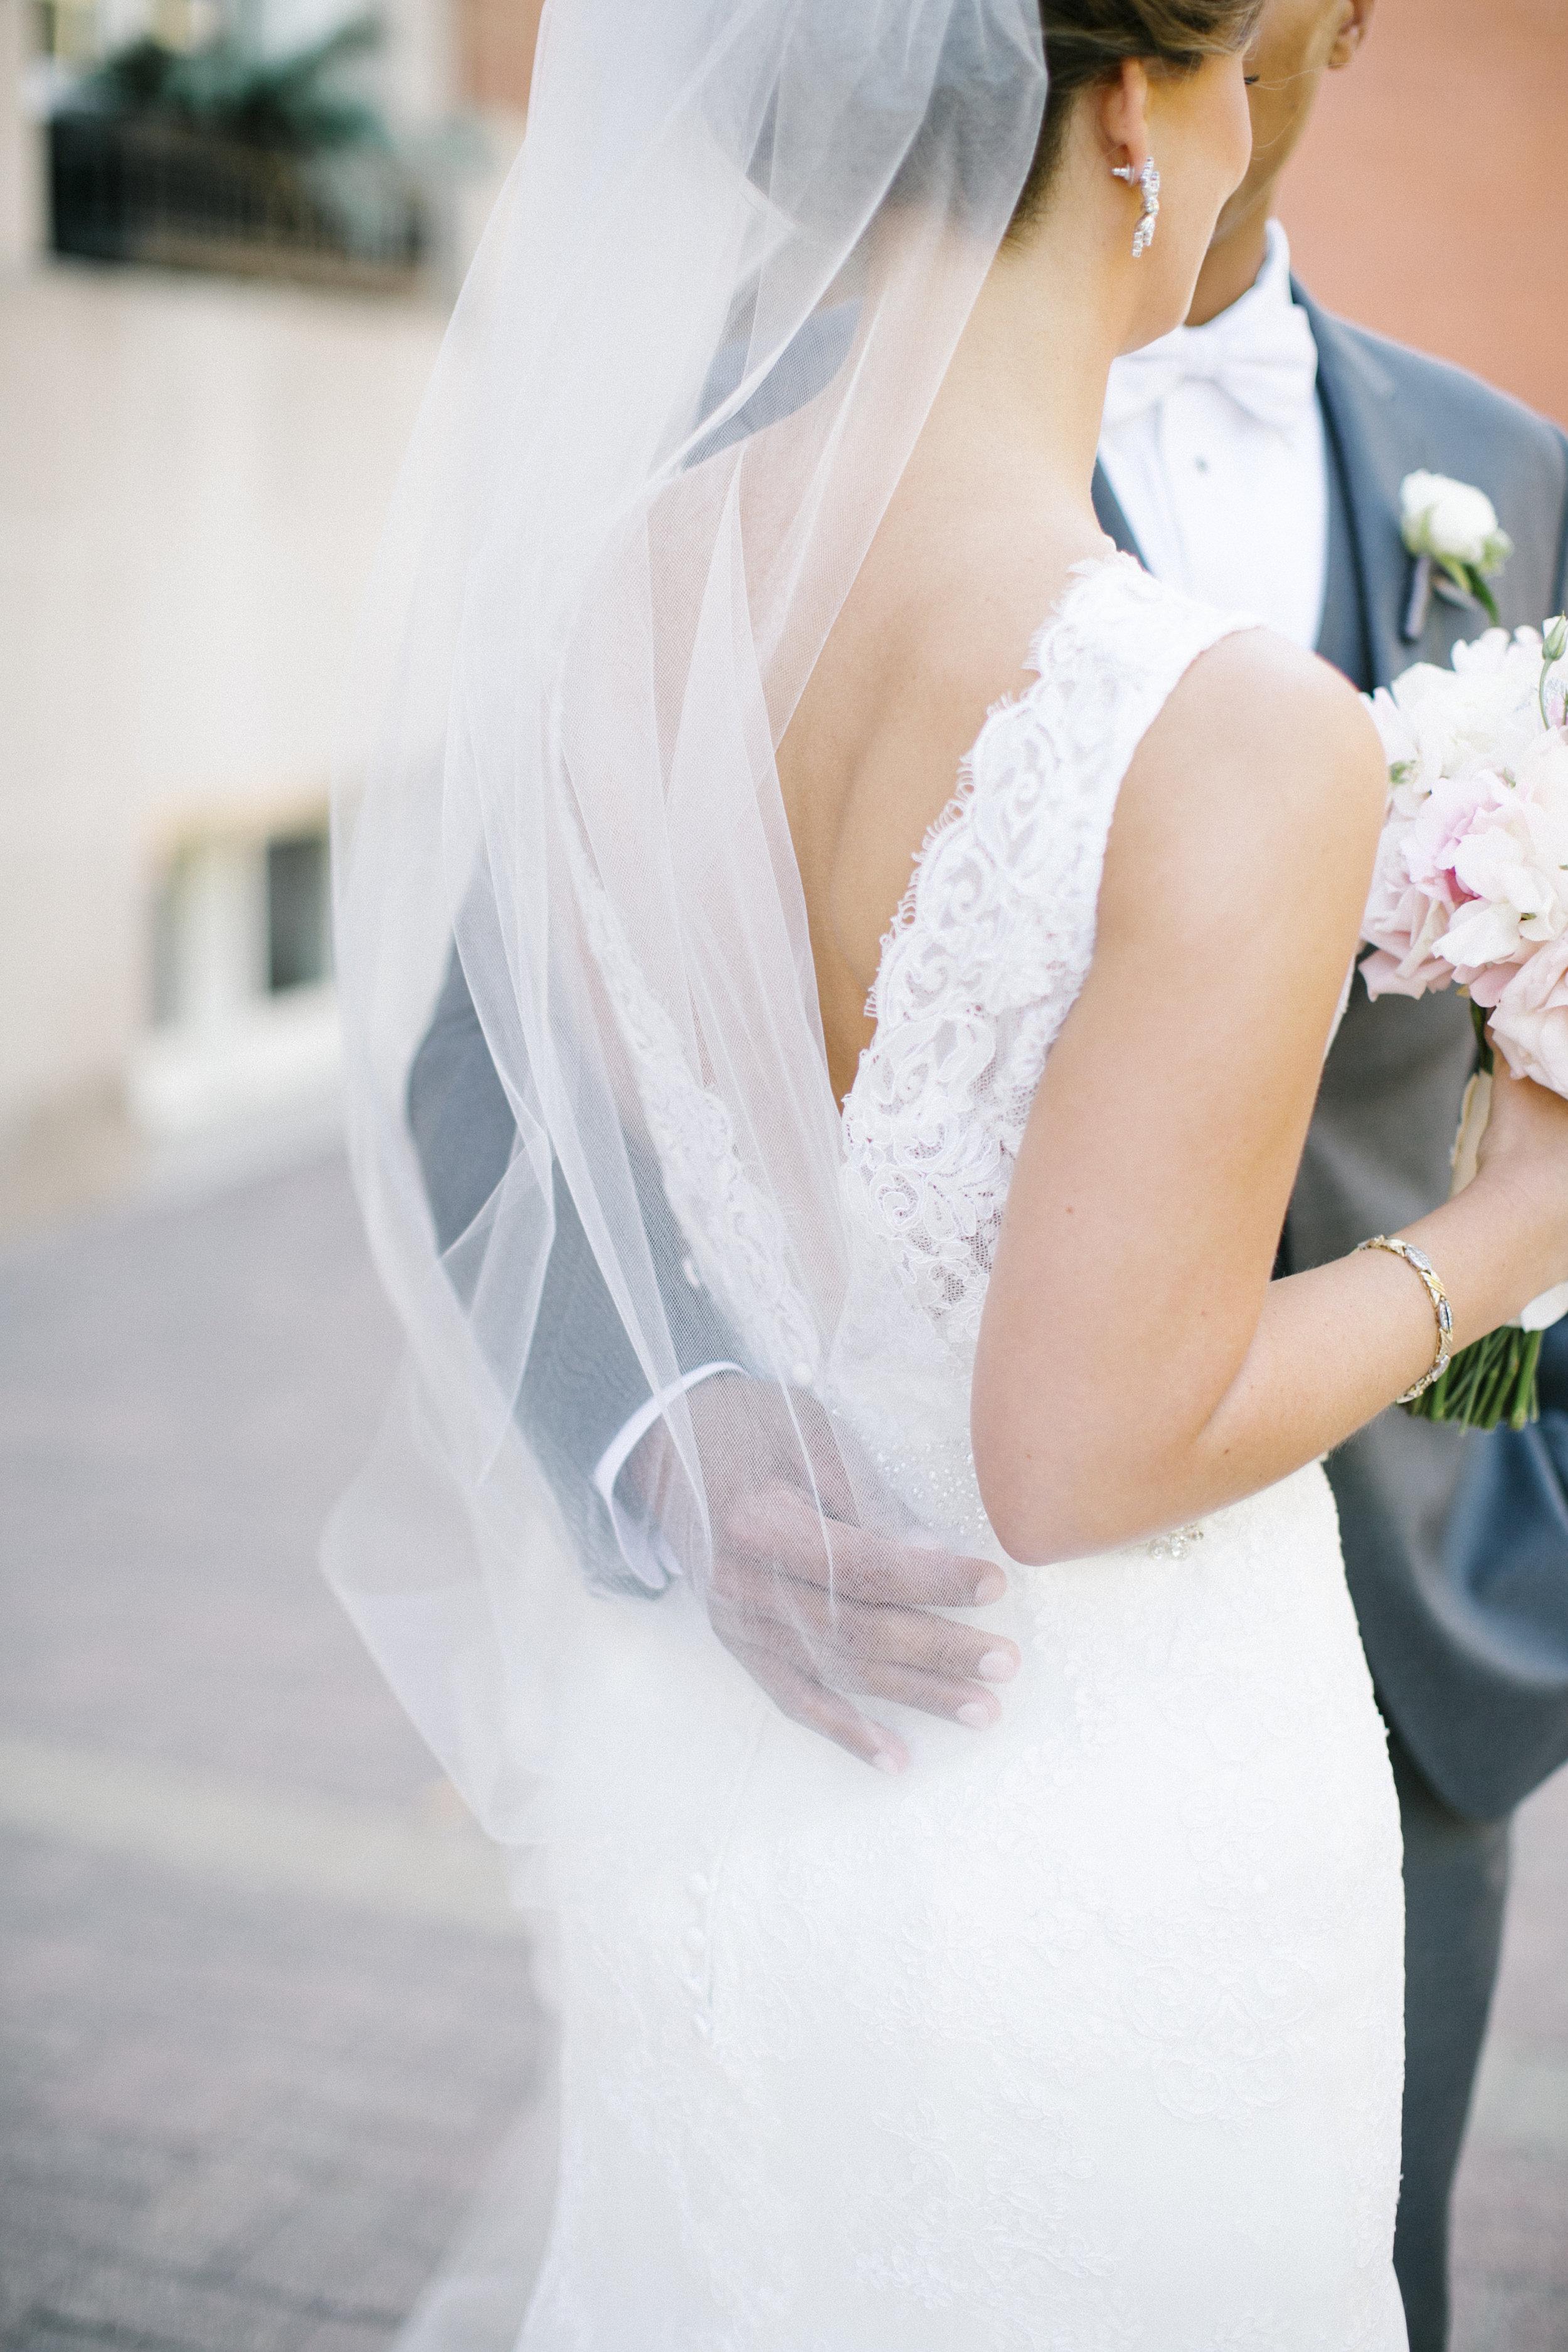 Lovell-Dillahunty Wedding_199.jpg